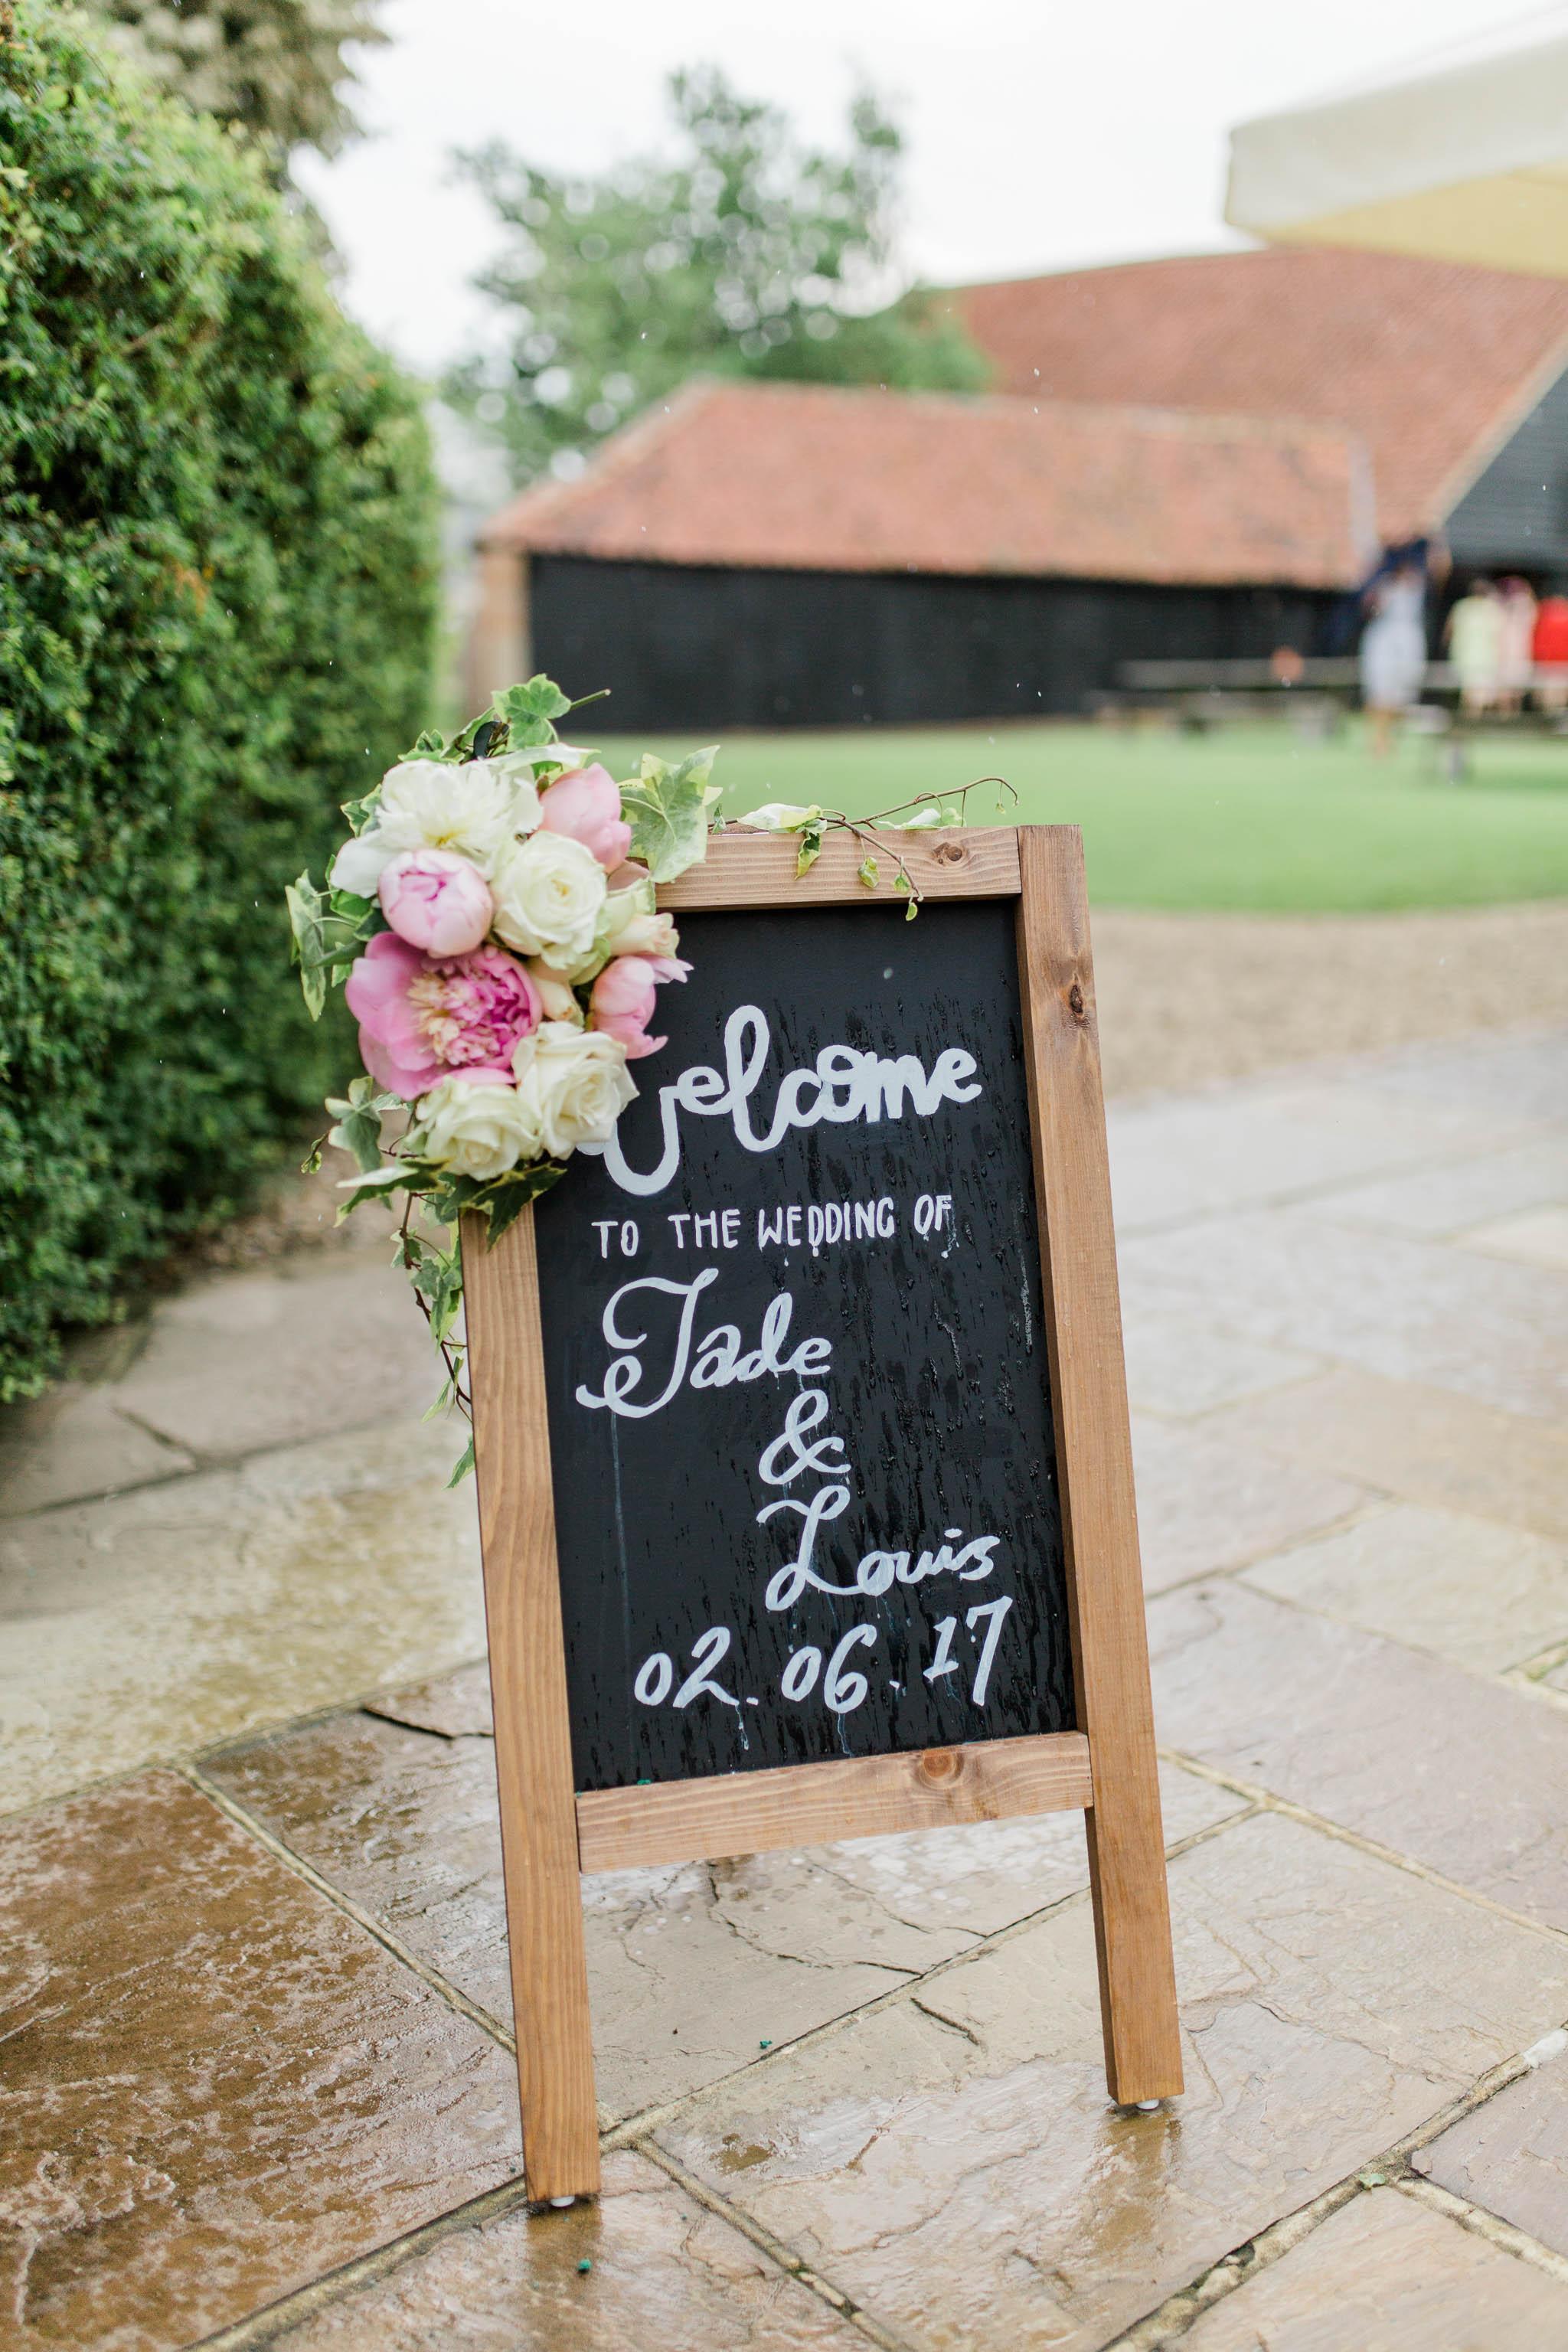 rainy wedding day welcome sign